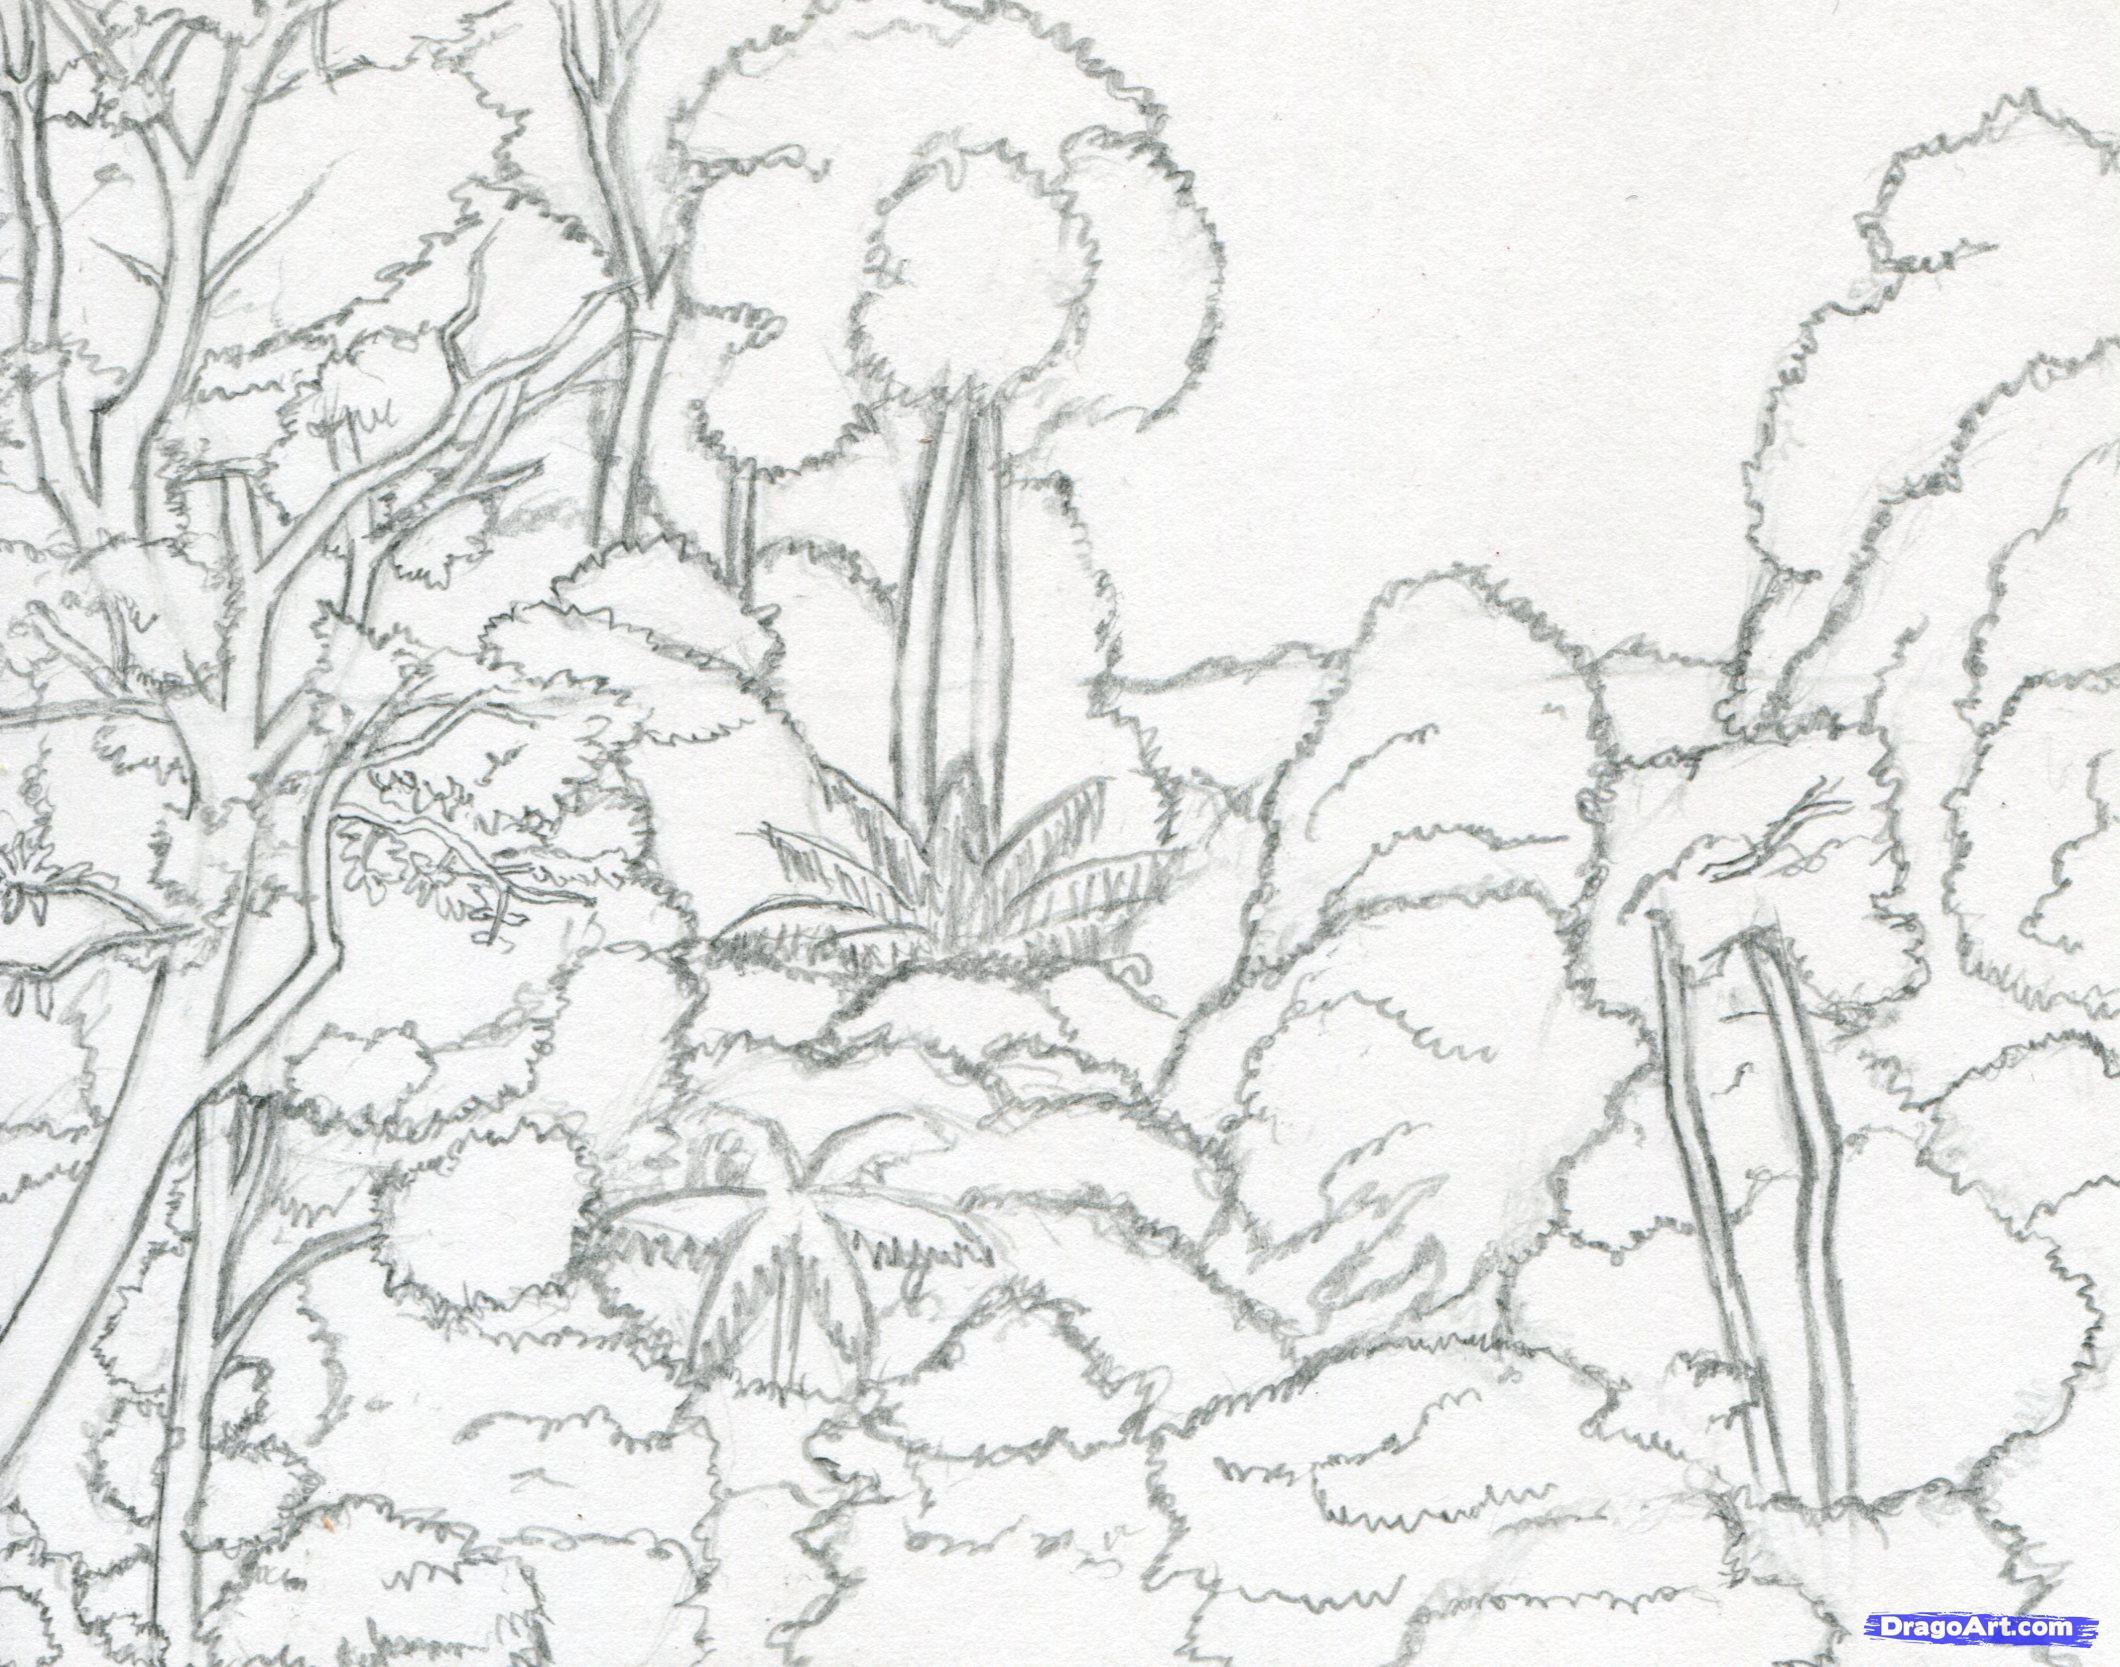 2120x1667 Tropical Rainforest Animals Drawing Draw A Rainforest.jpg